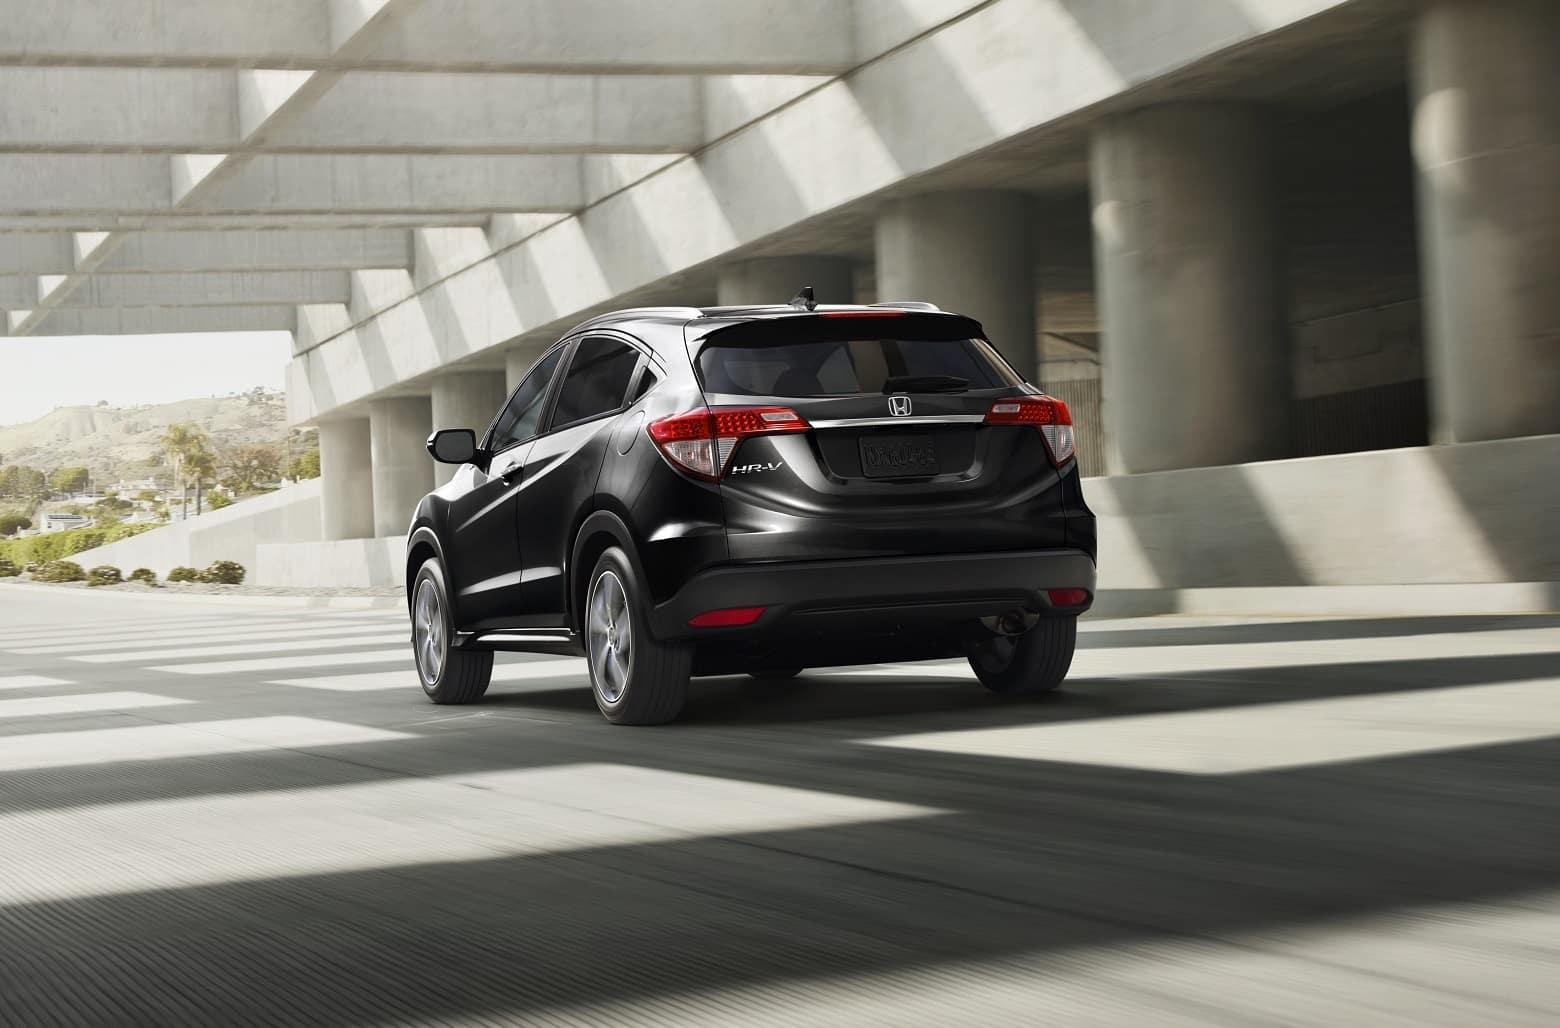 2021 Honda HR-V Driving